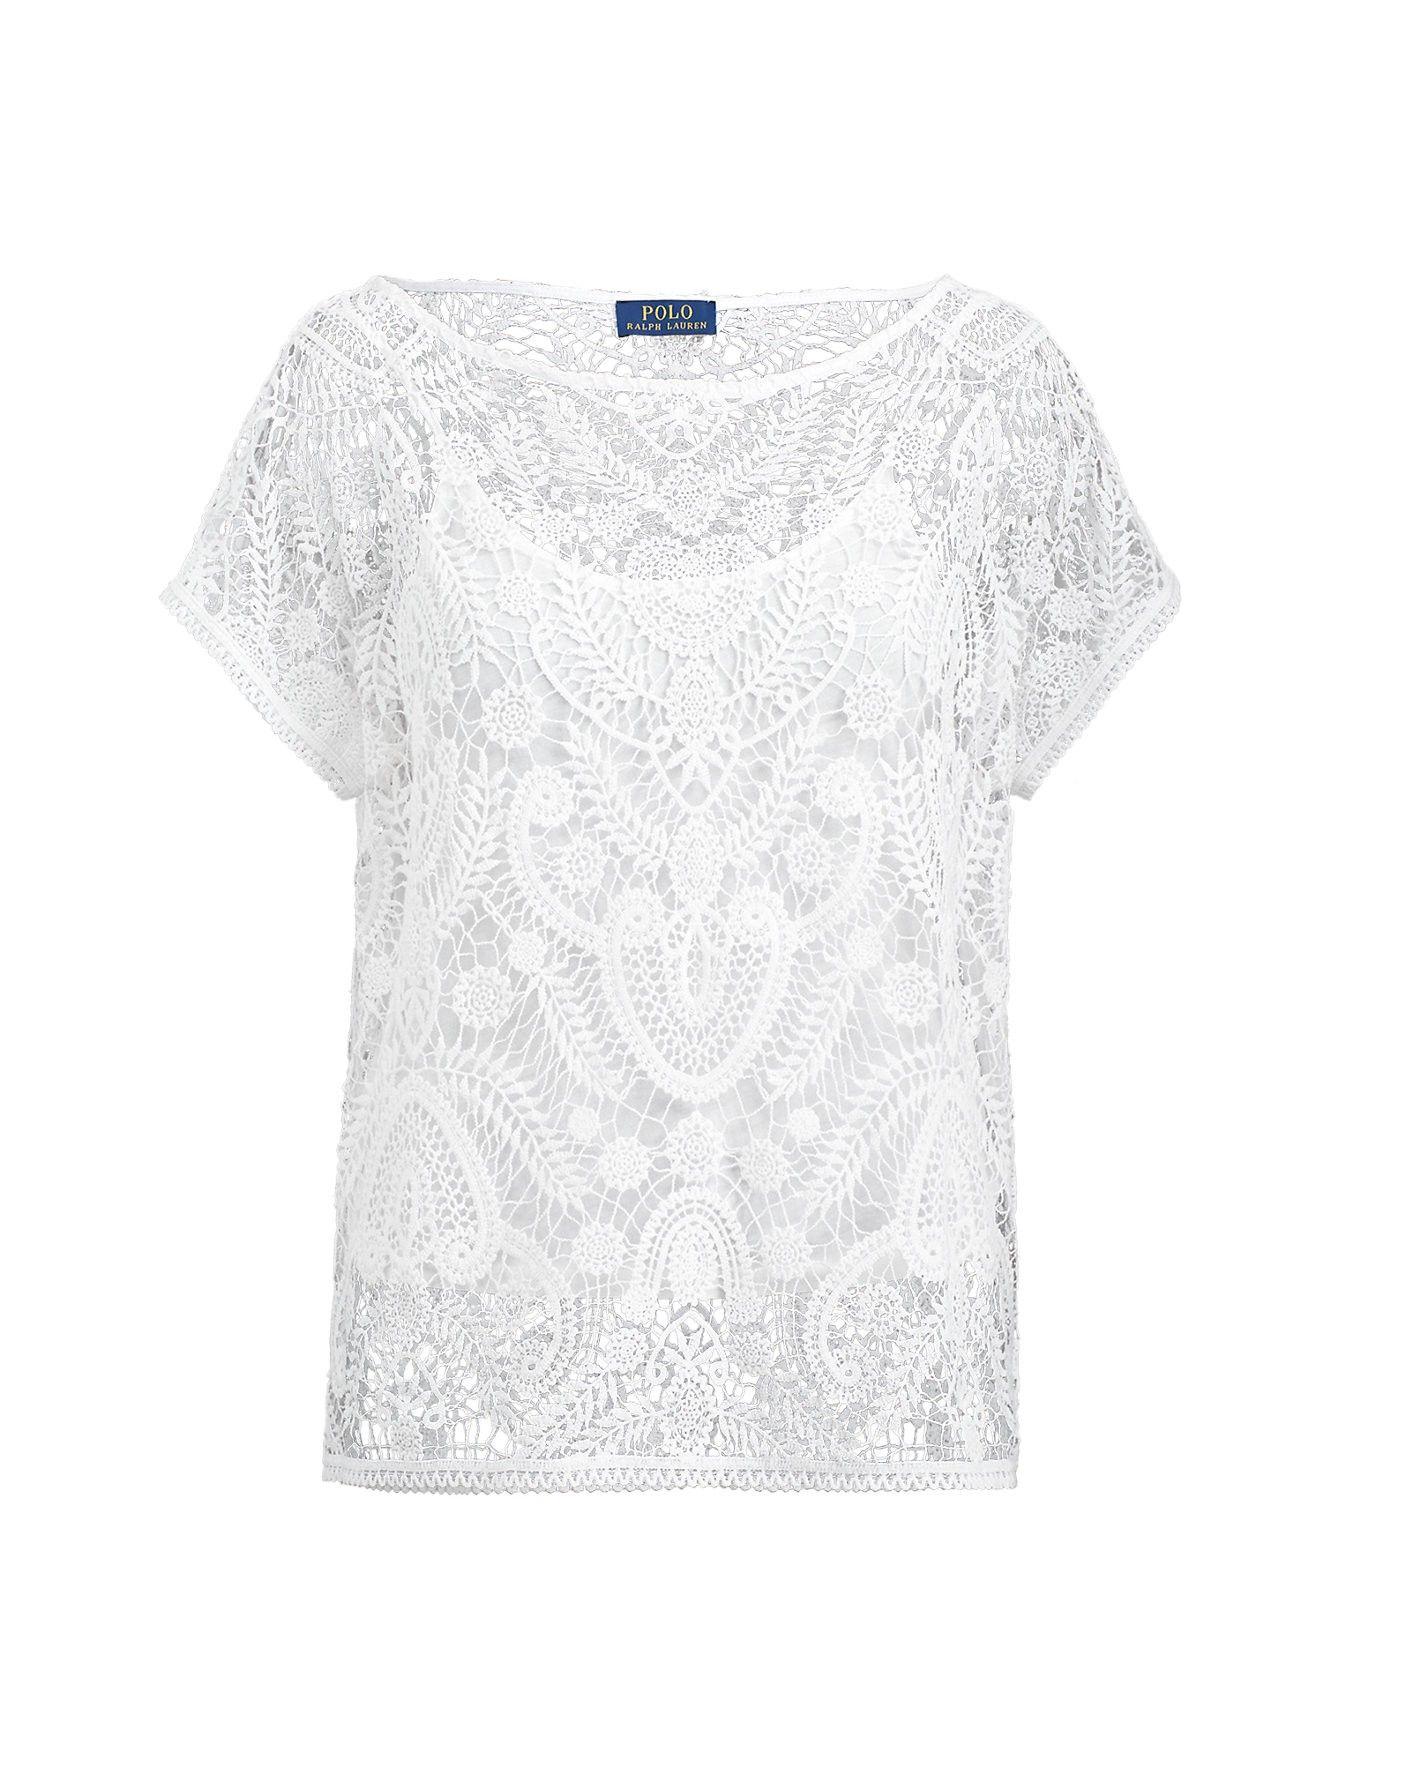 Polo Ralph Lauren Lace Short Sleeve Shirt In White Modesens White Lace Shirt Lace Shirt Sweaters For Women